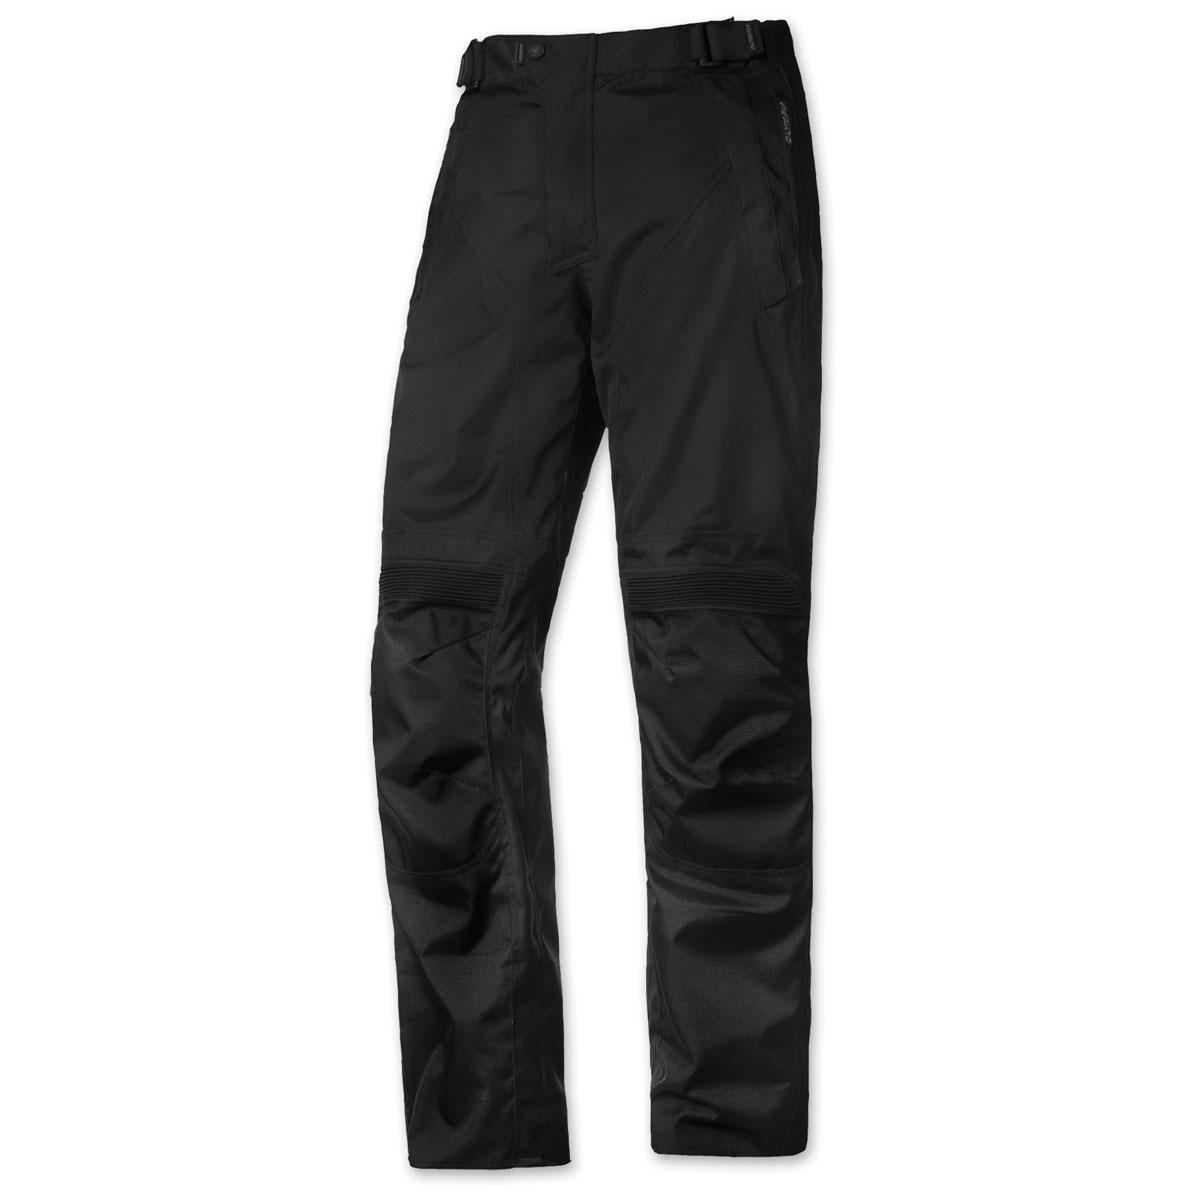 Olympia Moto Sports Men's Sentry 3 Black Pants